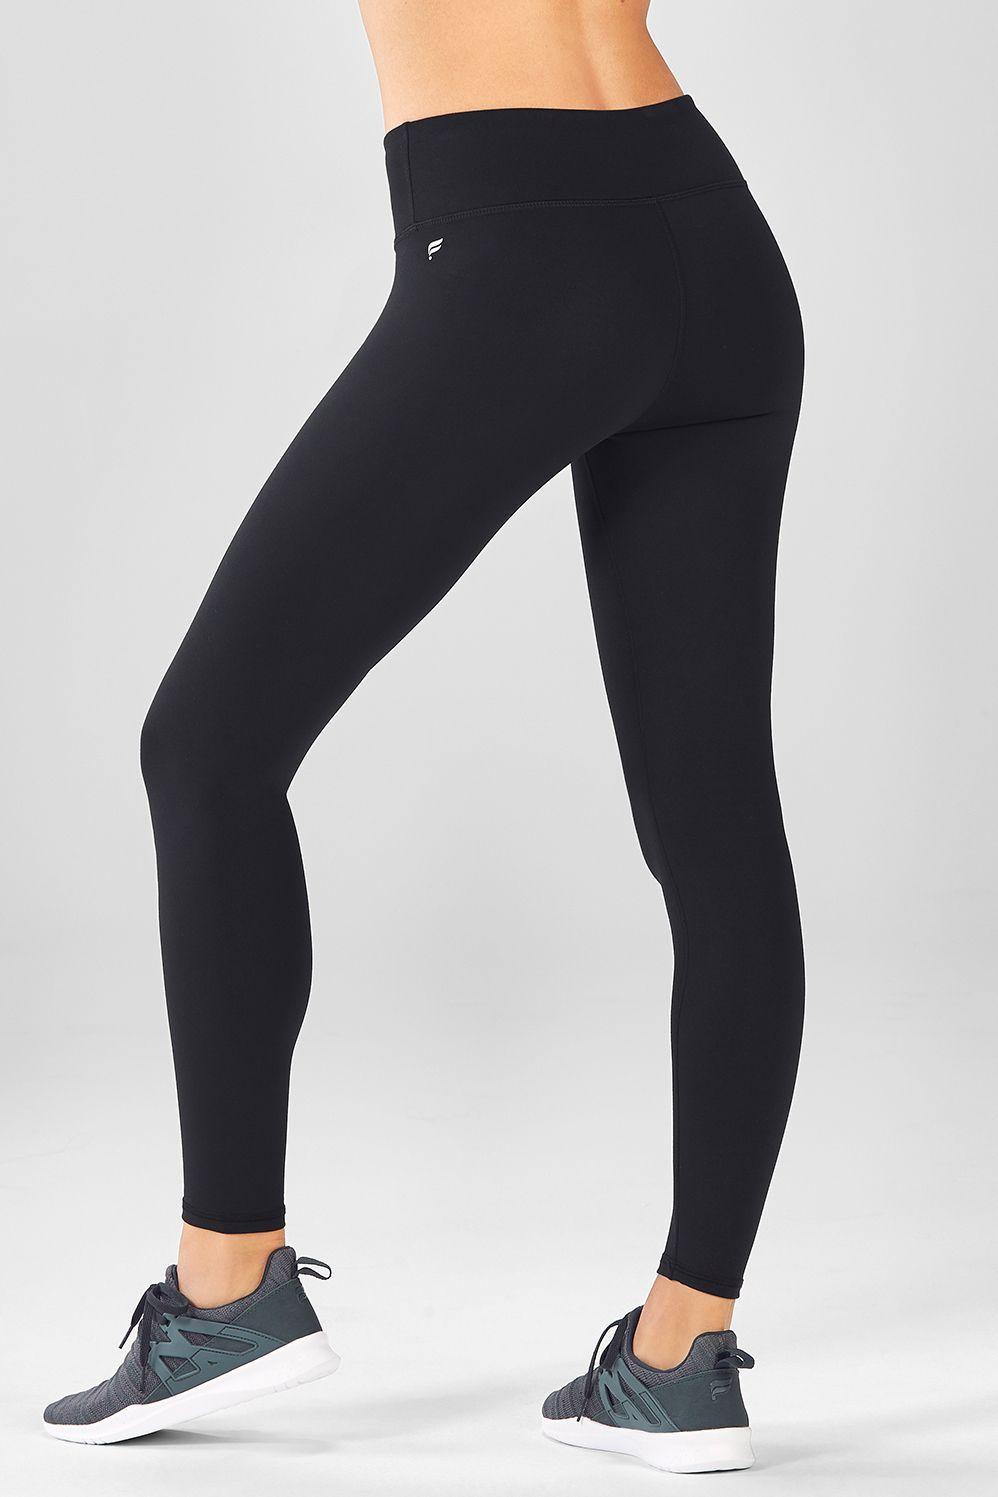 299264e0ae192a Salar Solid PowerHold® Legging in 2019 | special | Tight leggings ...